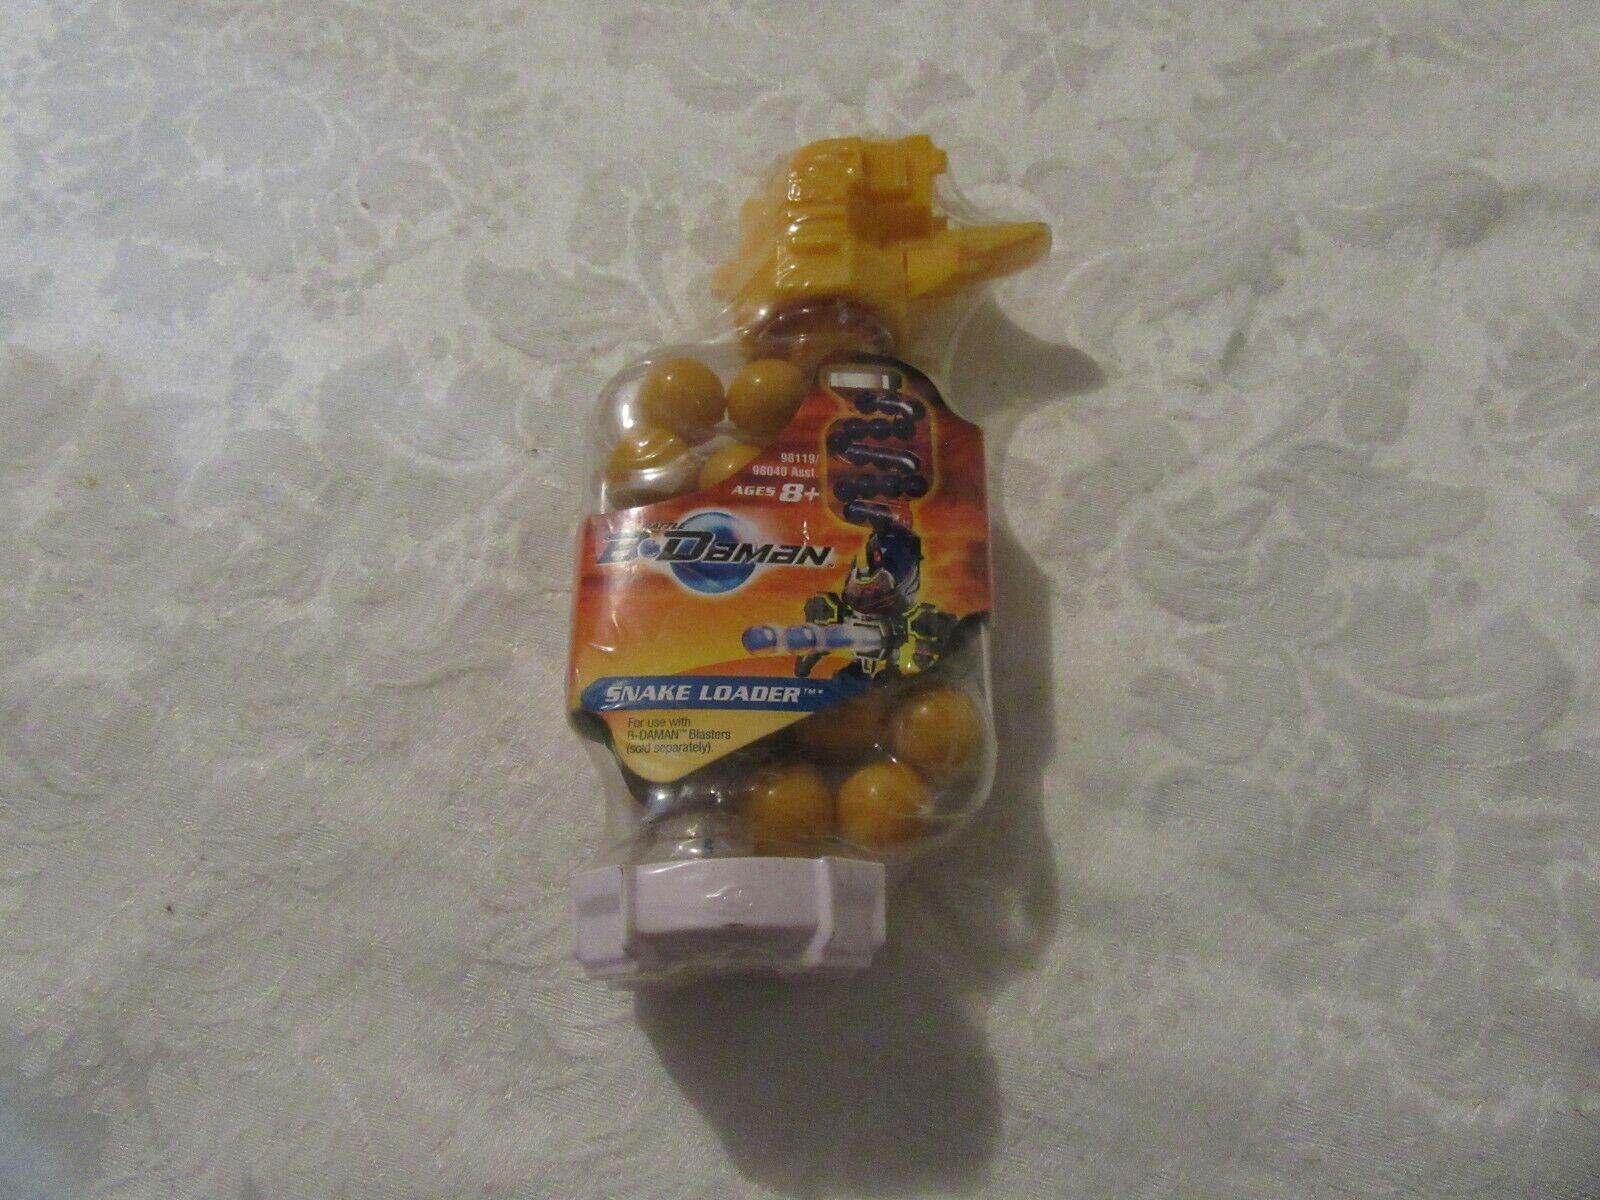 Hasbro 2005 Battle B-Daman Snake Loader Yellow